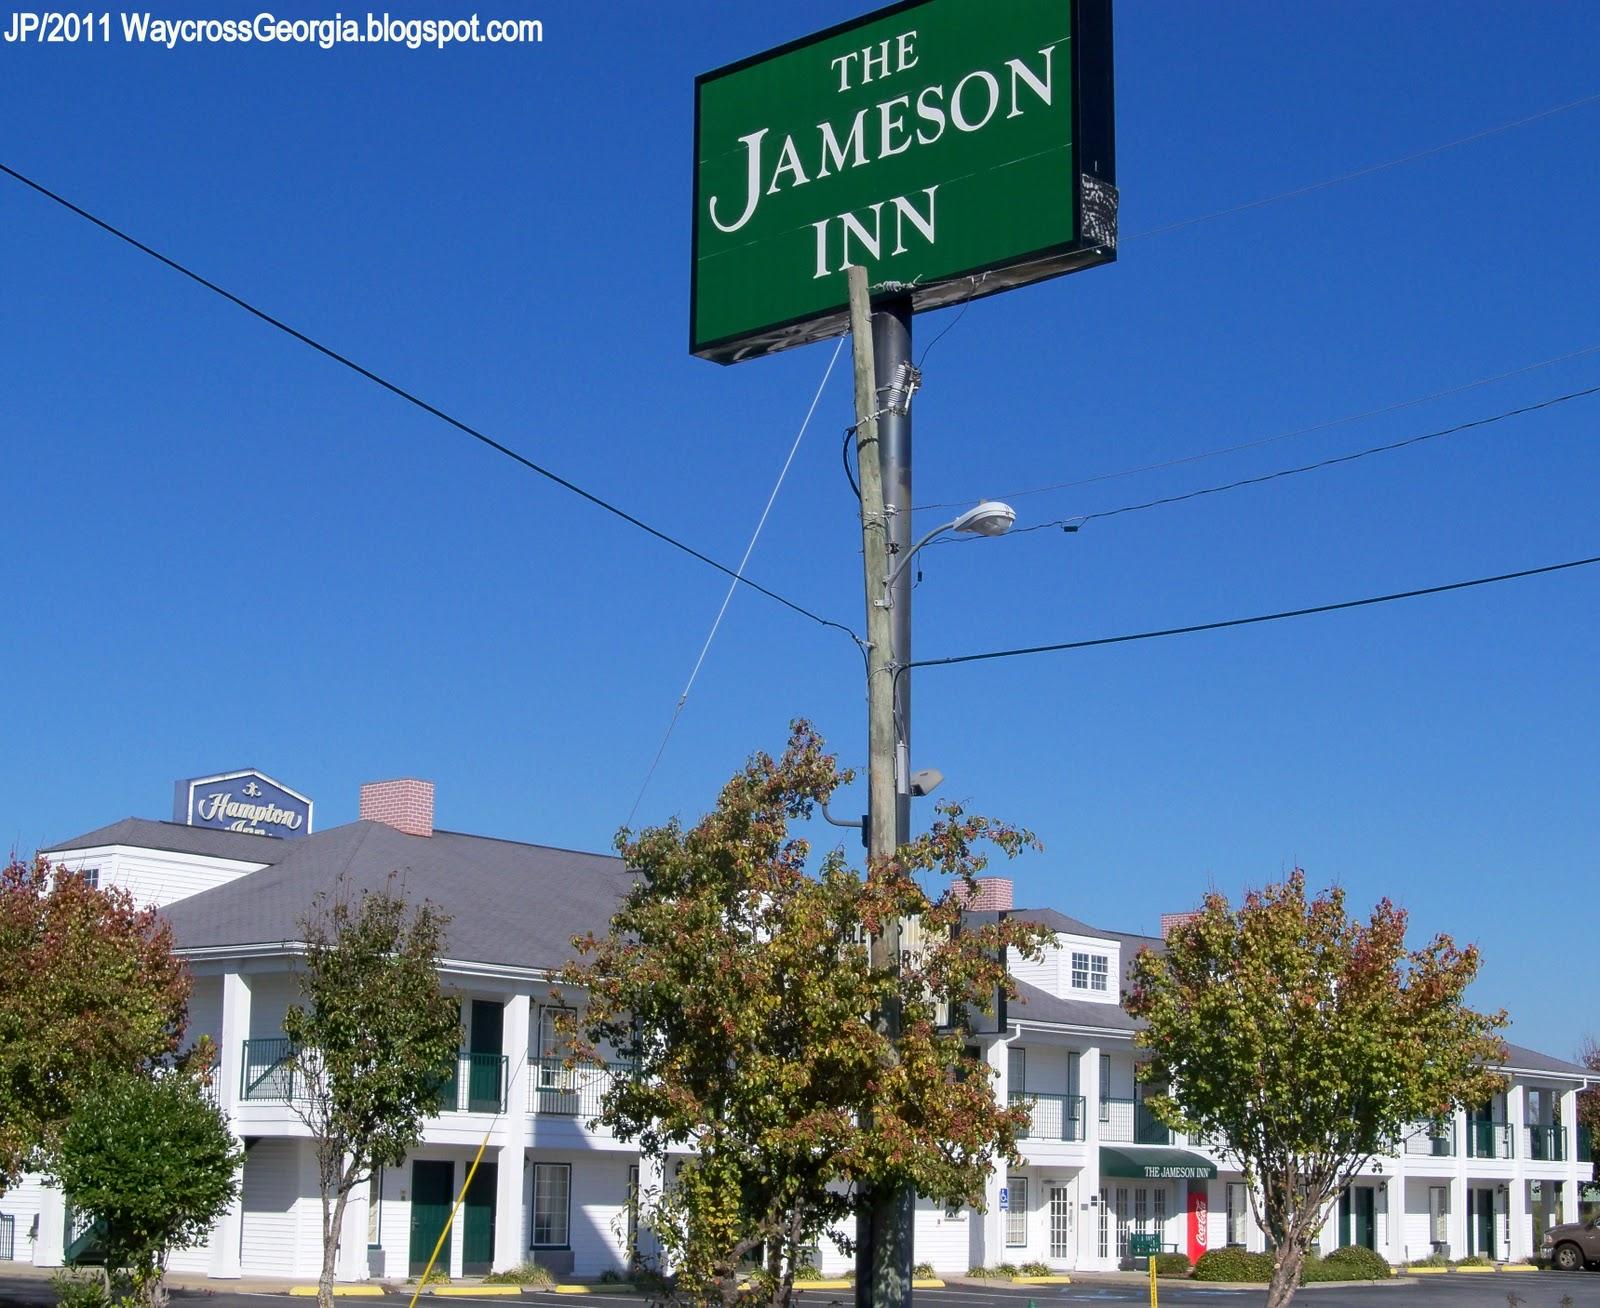 Jameson Inn Hotel Waycross Georgia The Lodging Ga Ware County